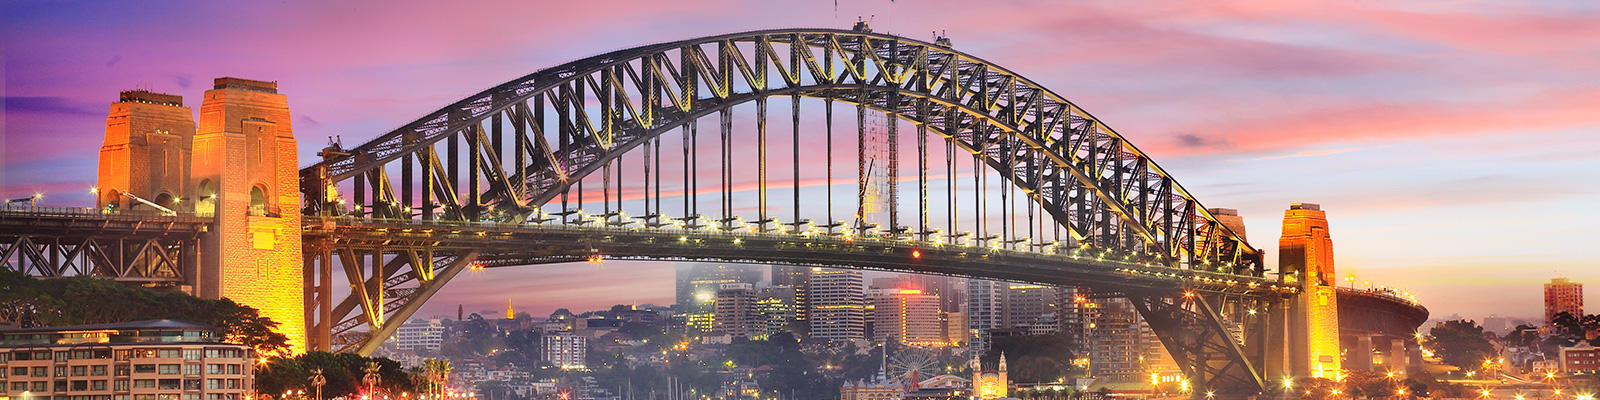 Sydney Harbour Bridge twinkles with lights at sunrise - Sydney spots to inspire creativity